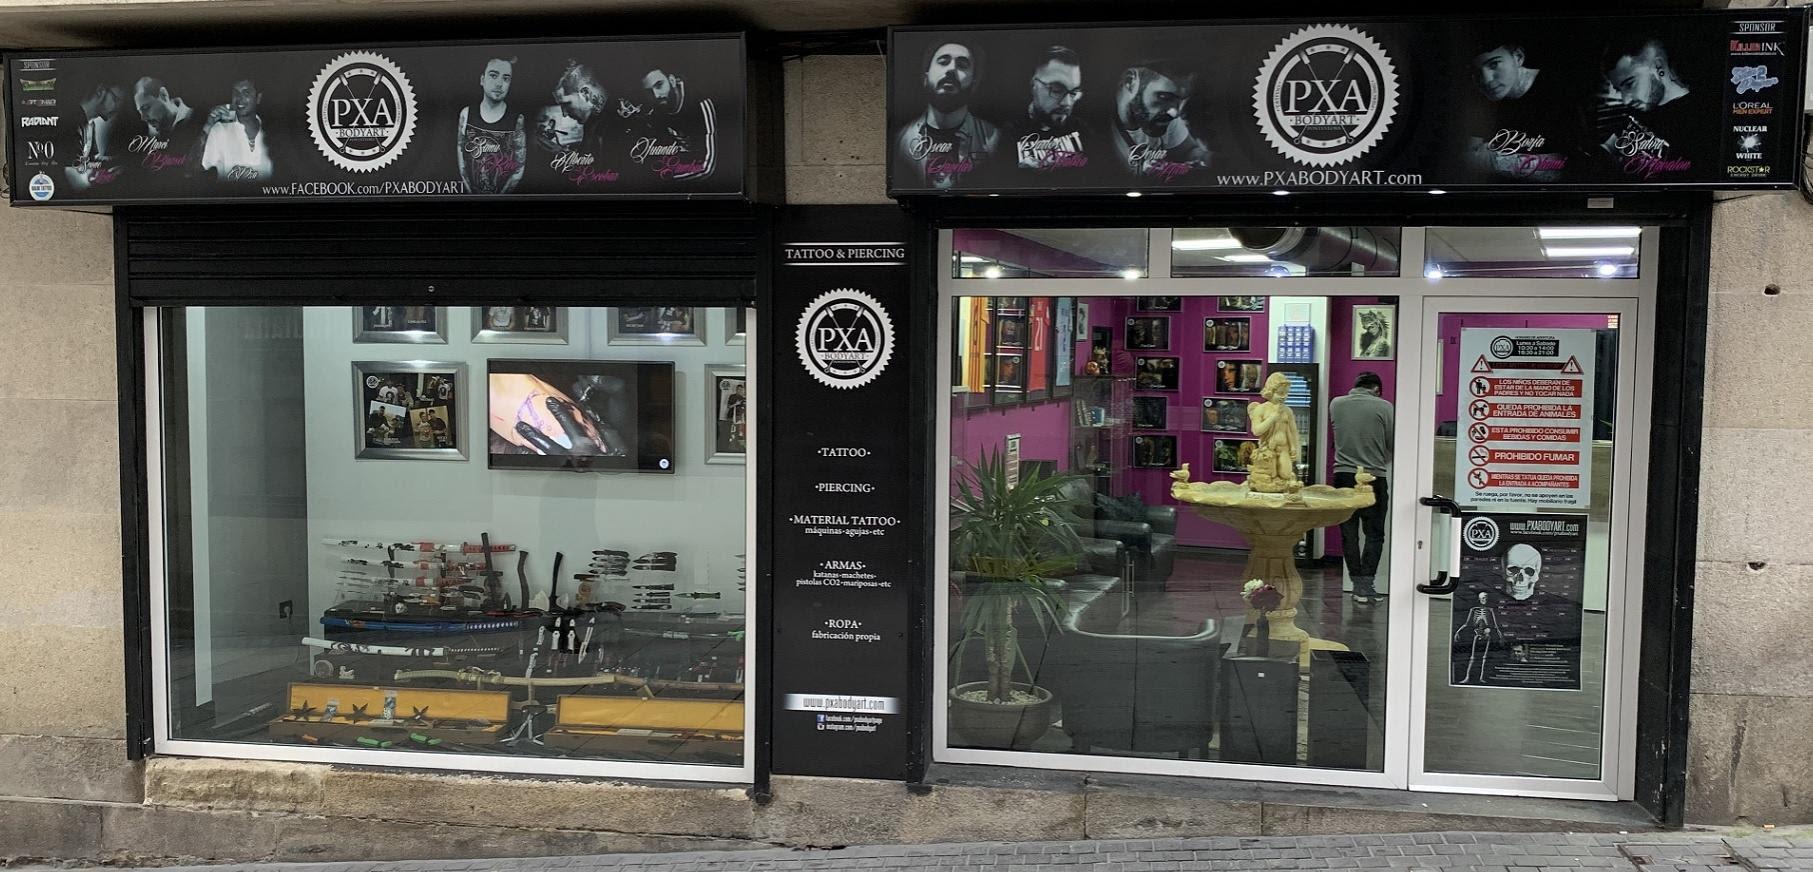 Pxa Body Art Estudio De Tatuajes En Pontevedra Galicia